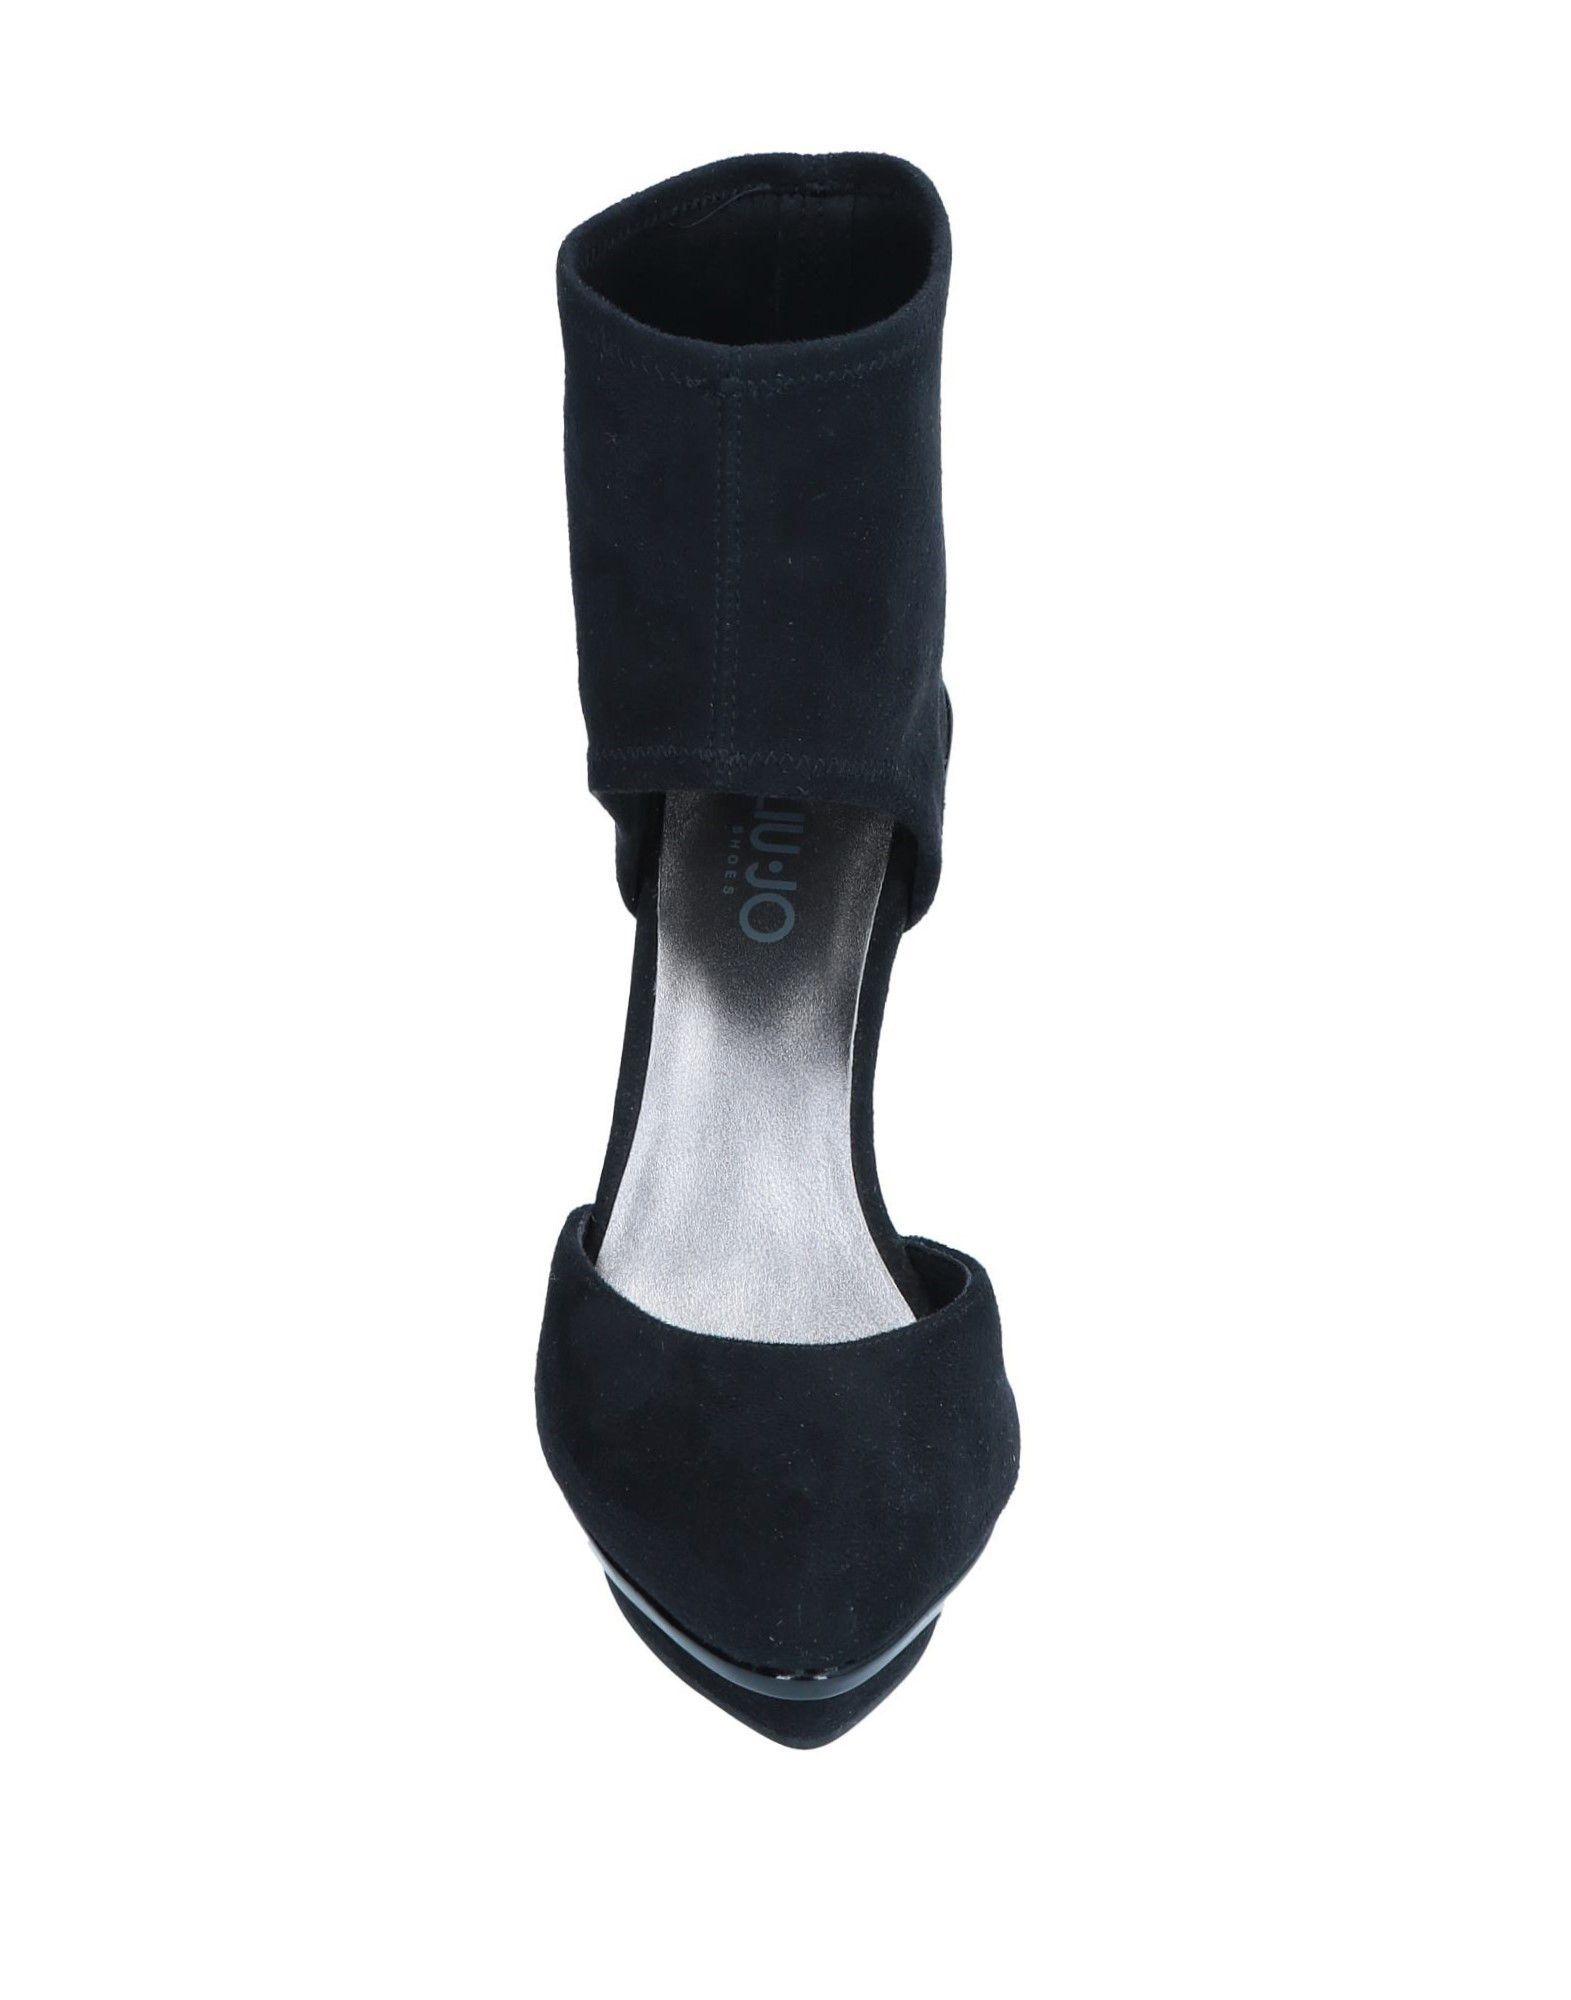 Liu •Jo Shoes Stiefelette Damen  11525099HA Gute Qualität beliebte Schuhe